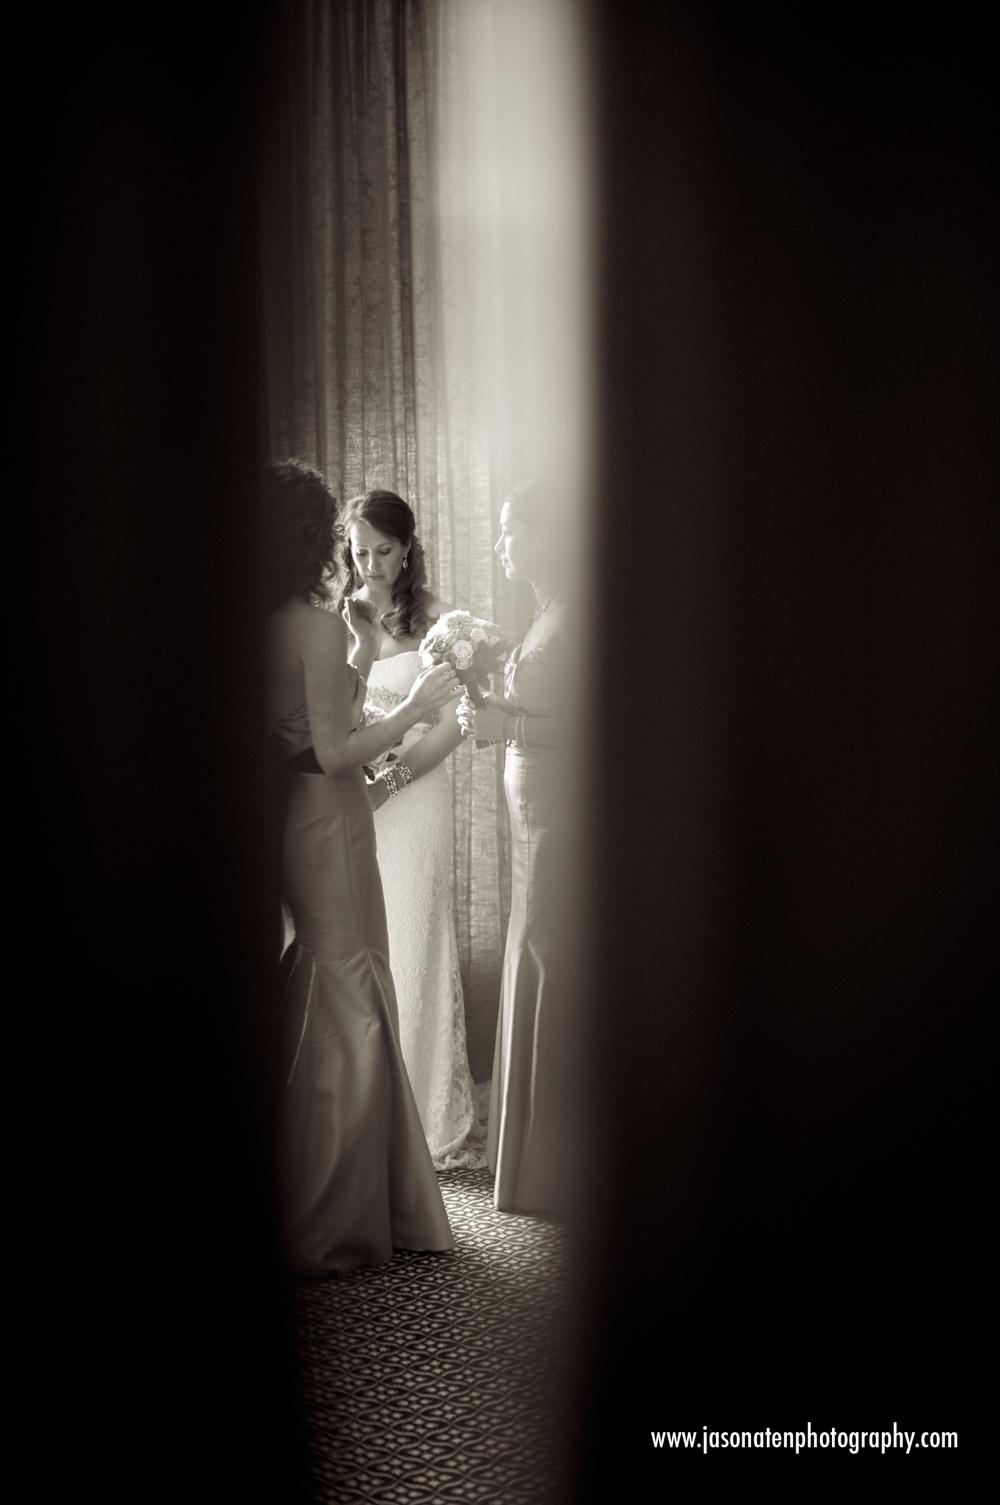 Michigan Wedding Photographer, Wedding Photography, Michigan Photographer